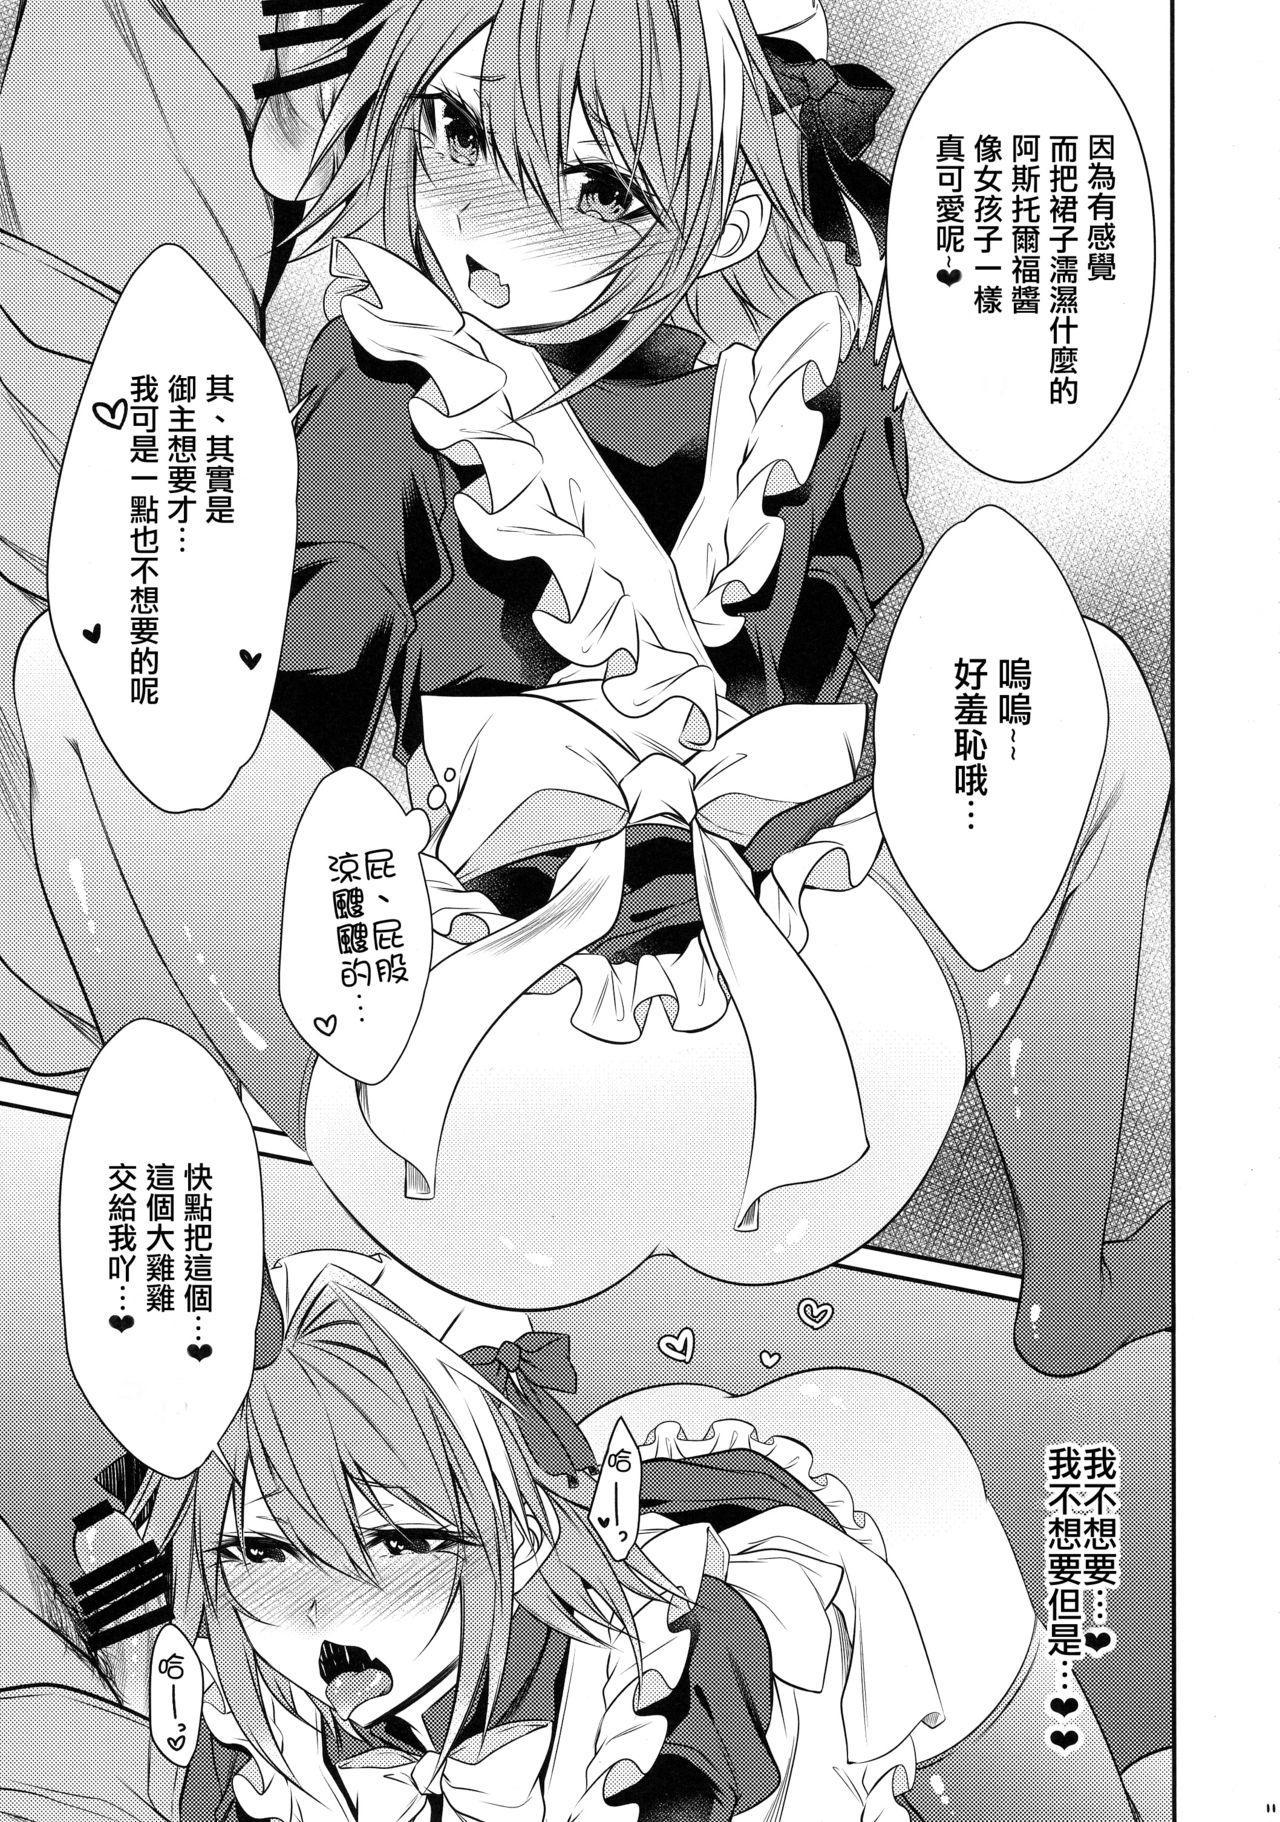 Maid in Astolfo 10